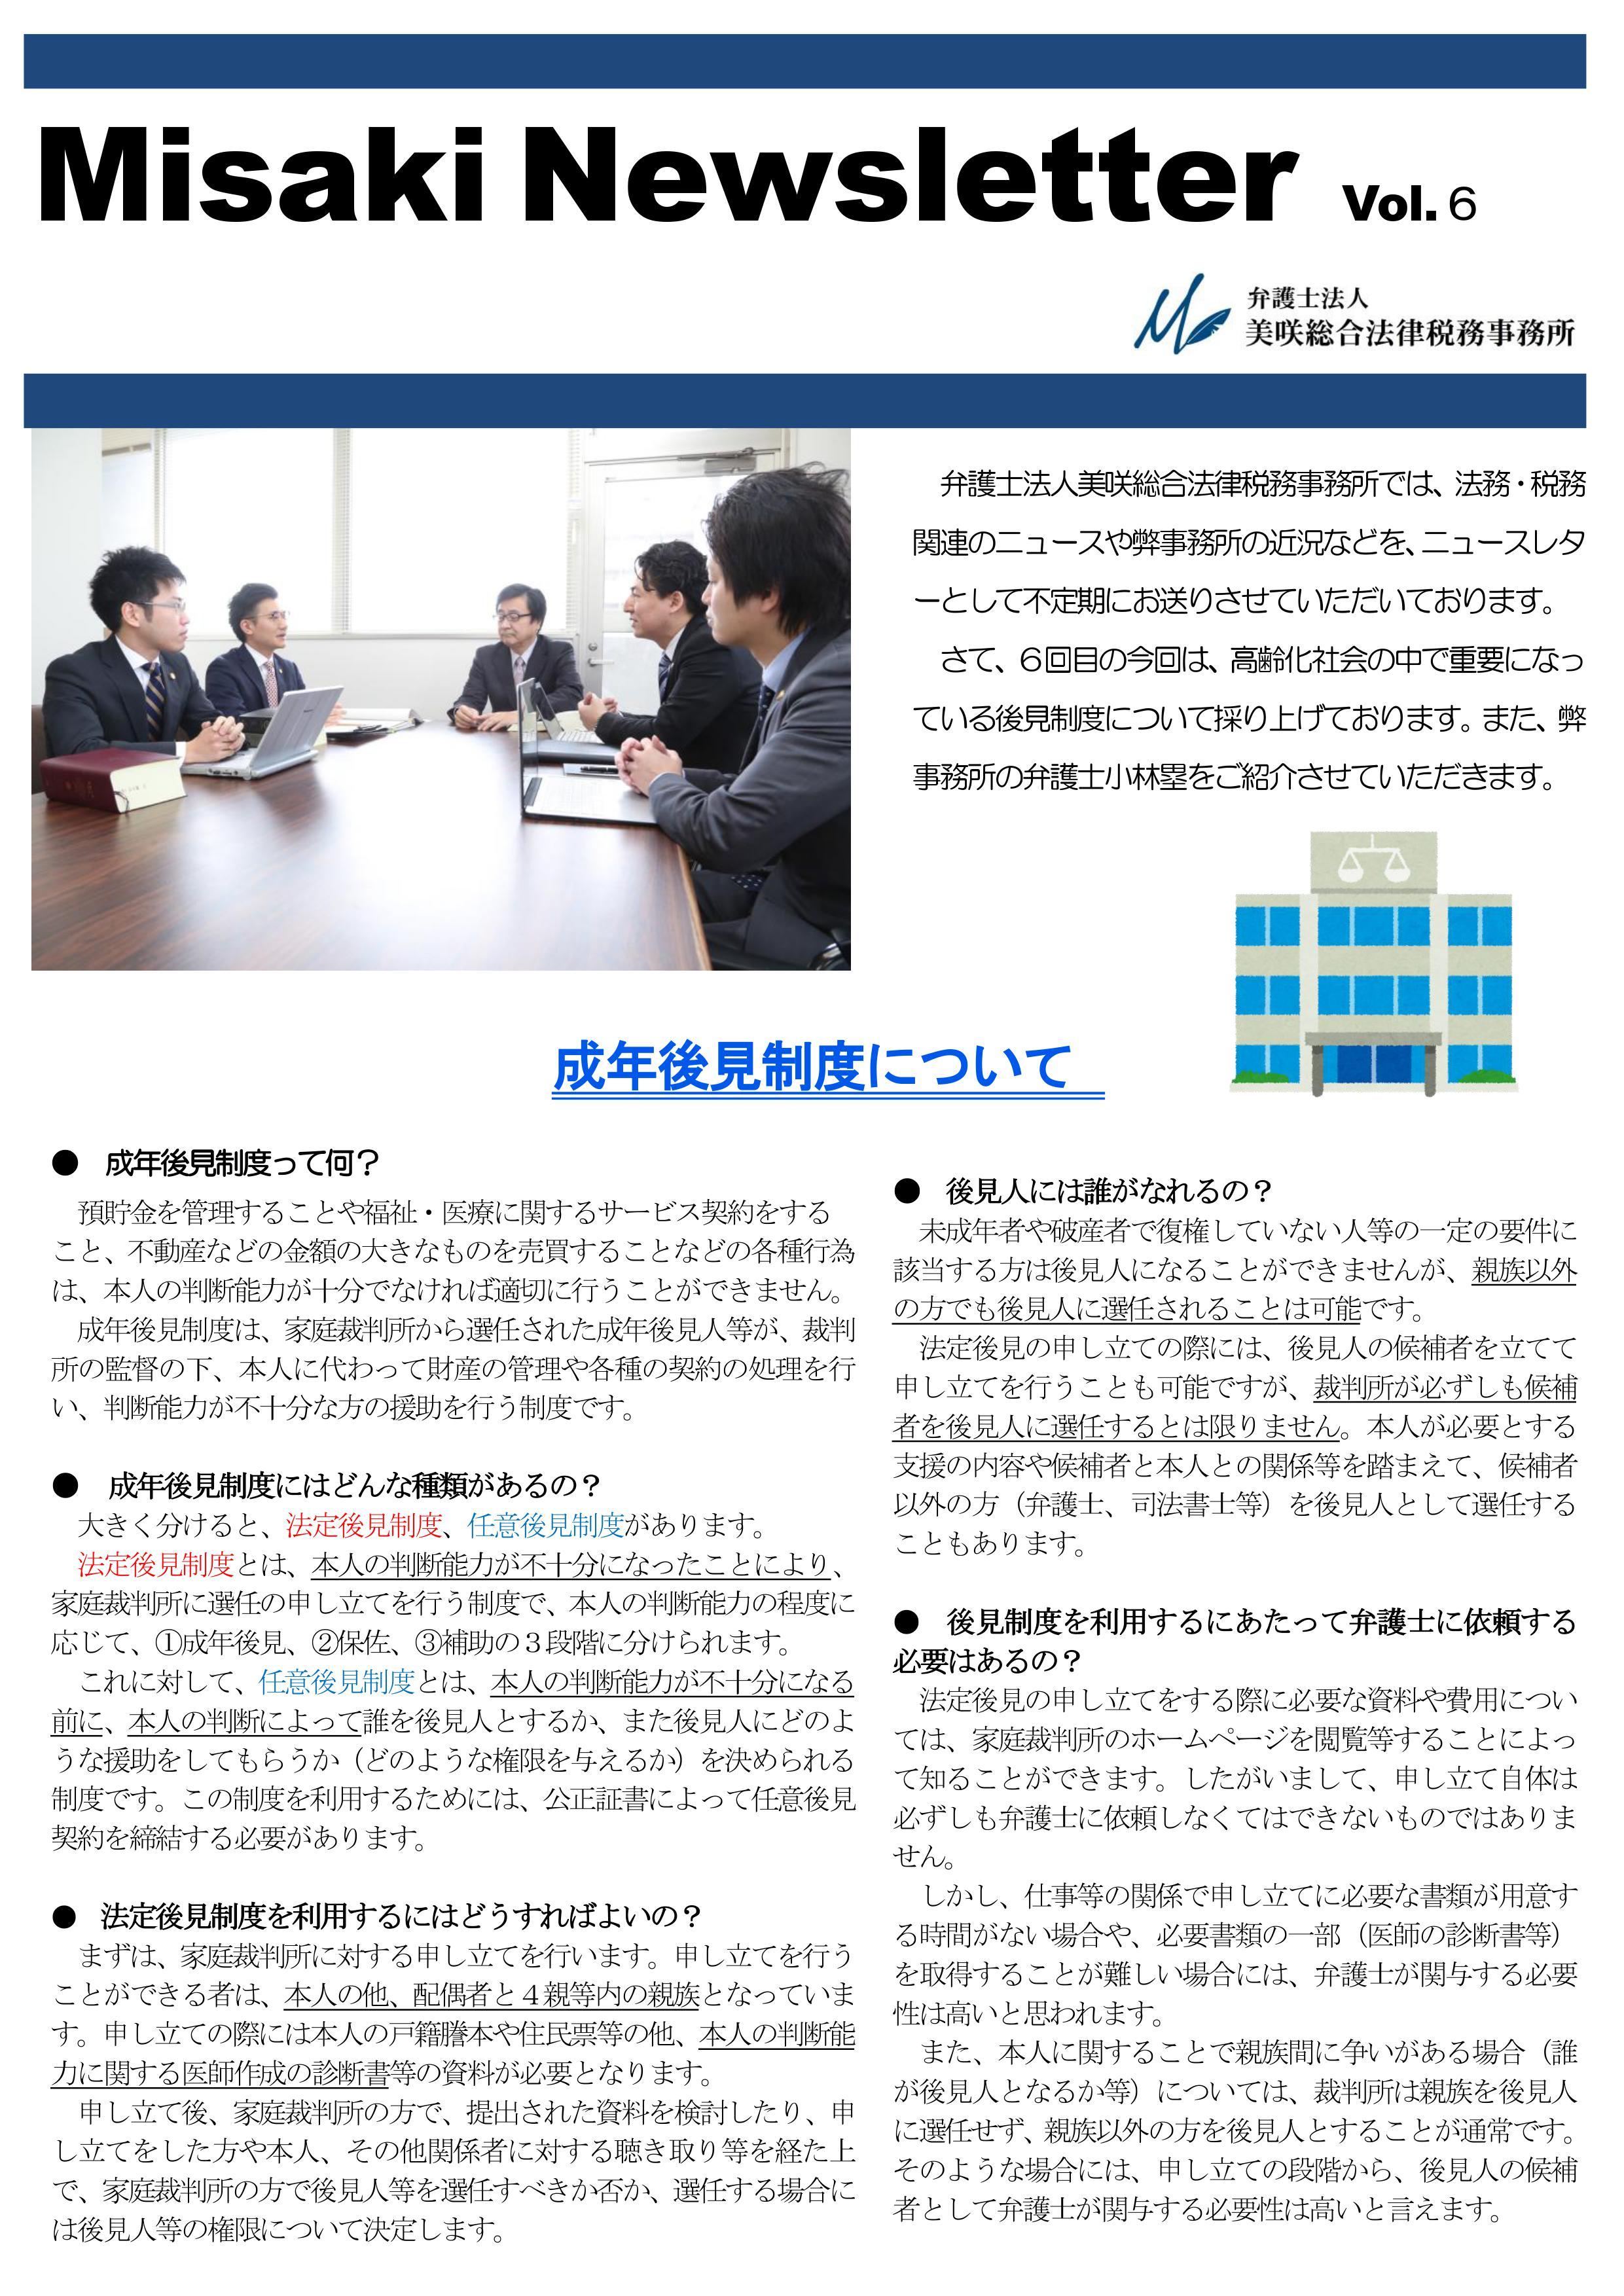 201612MISAKINewsletterVol.6.jpg